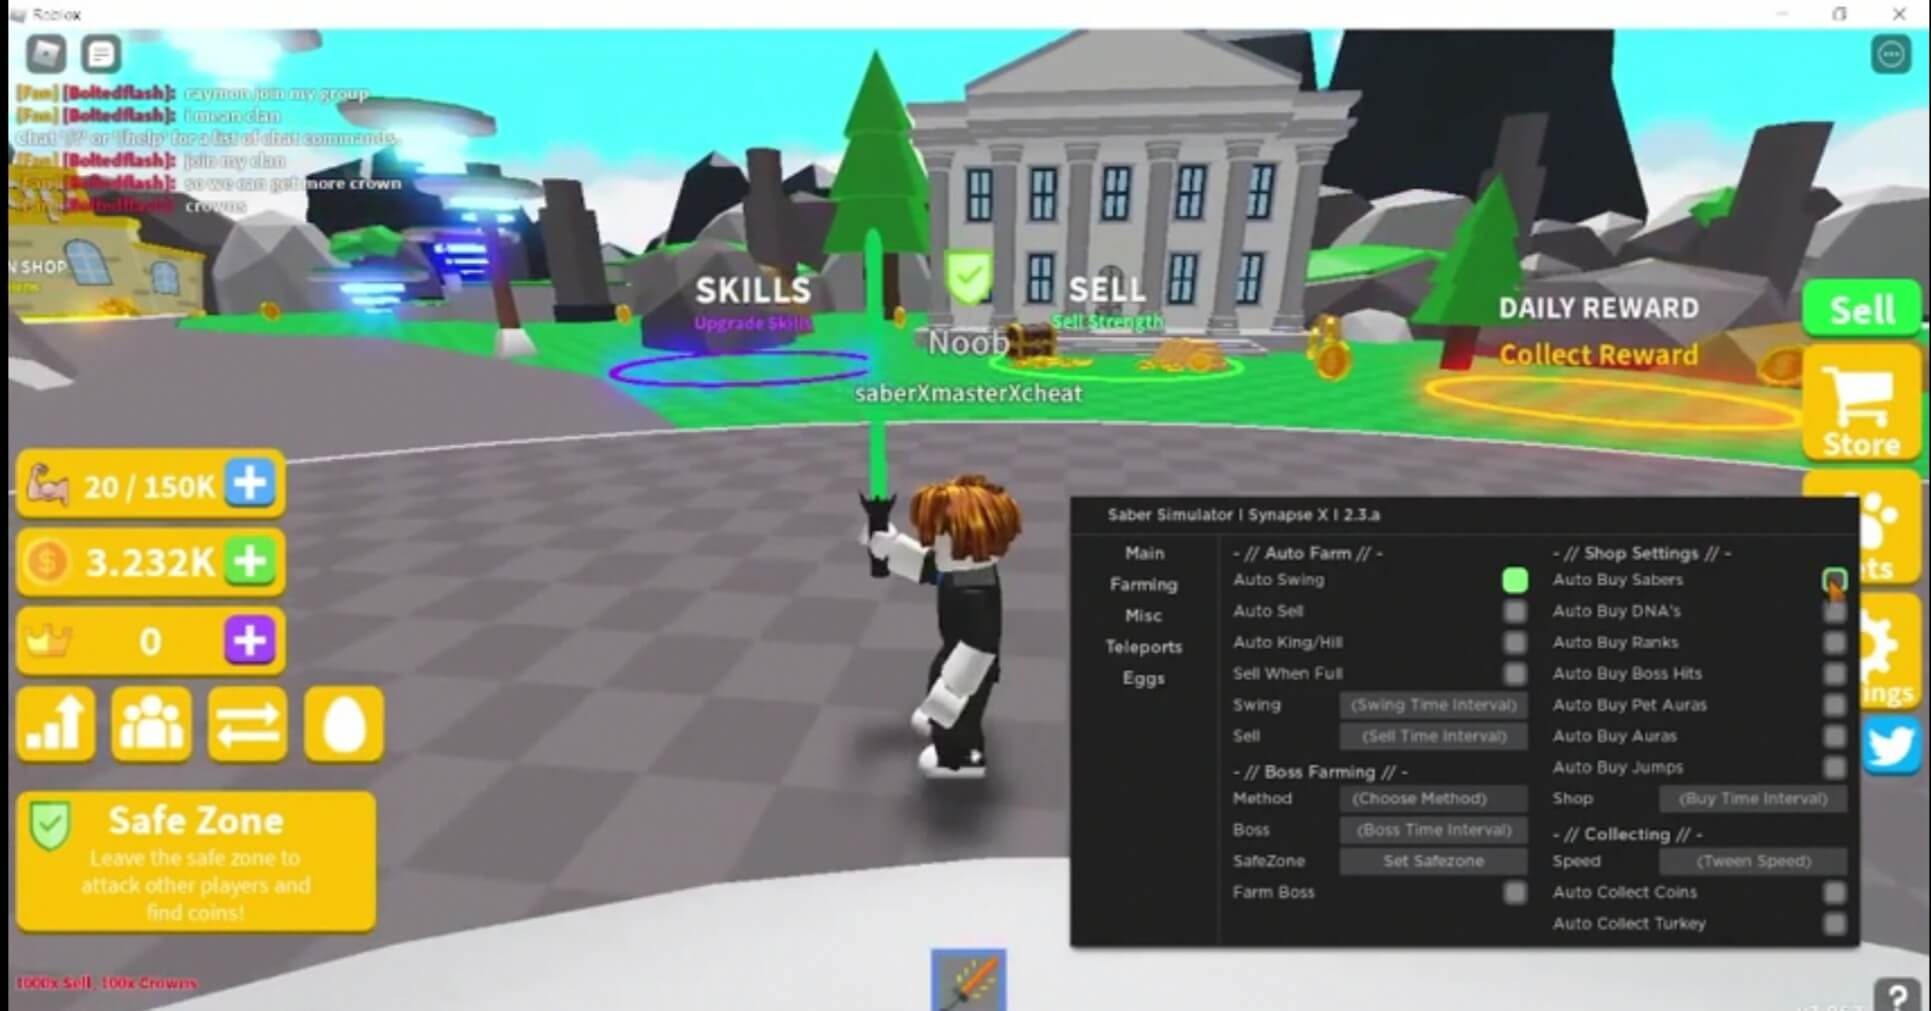 saber-simulator-script